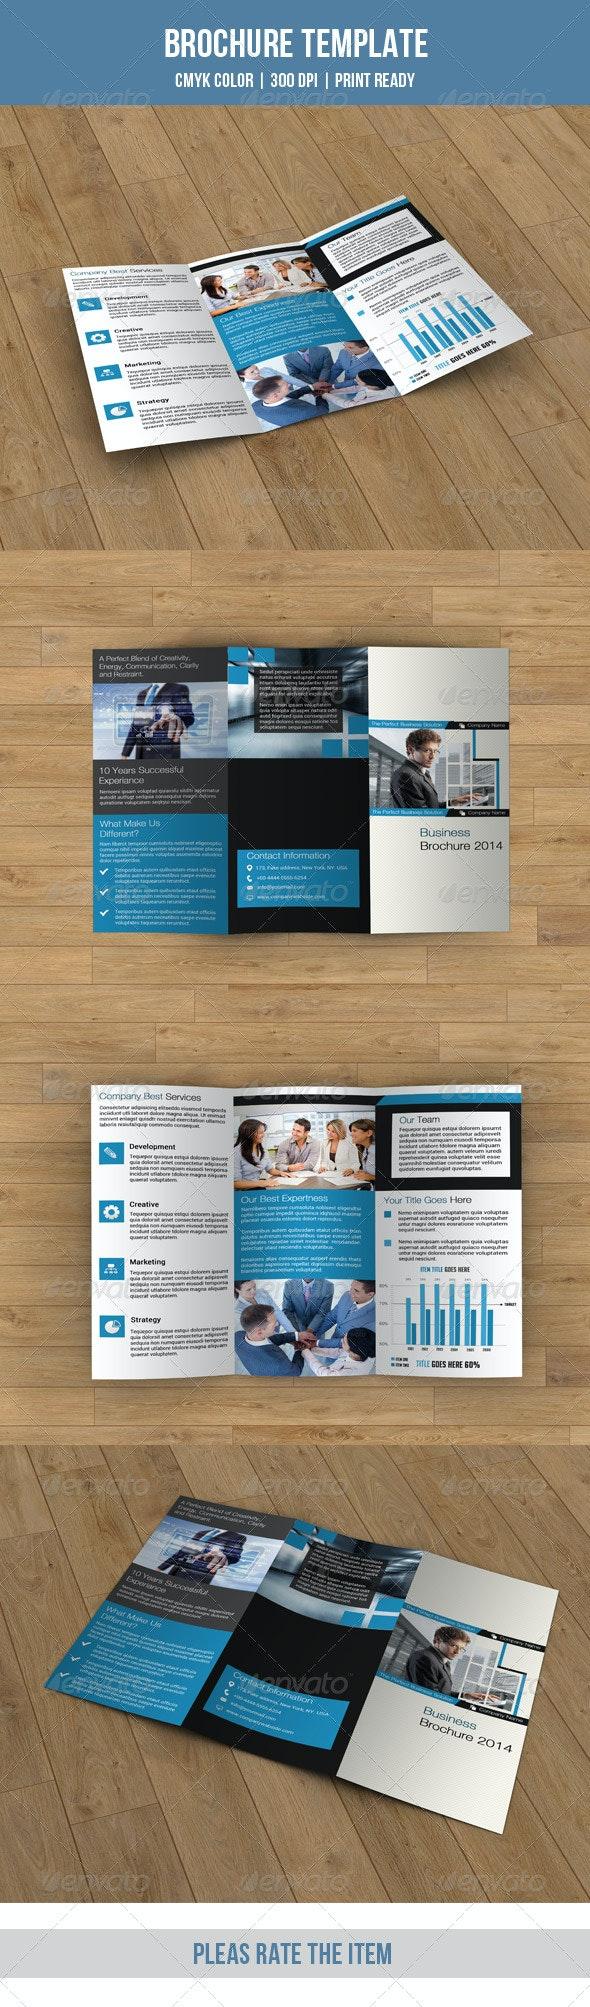 Trifold Business Brochure-V42 - Corporate Brochures